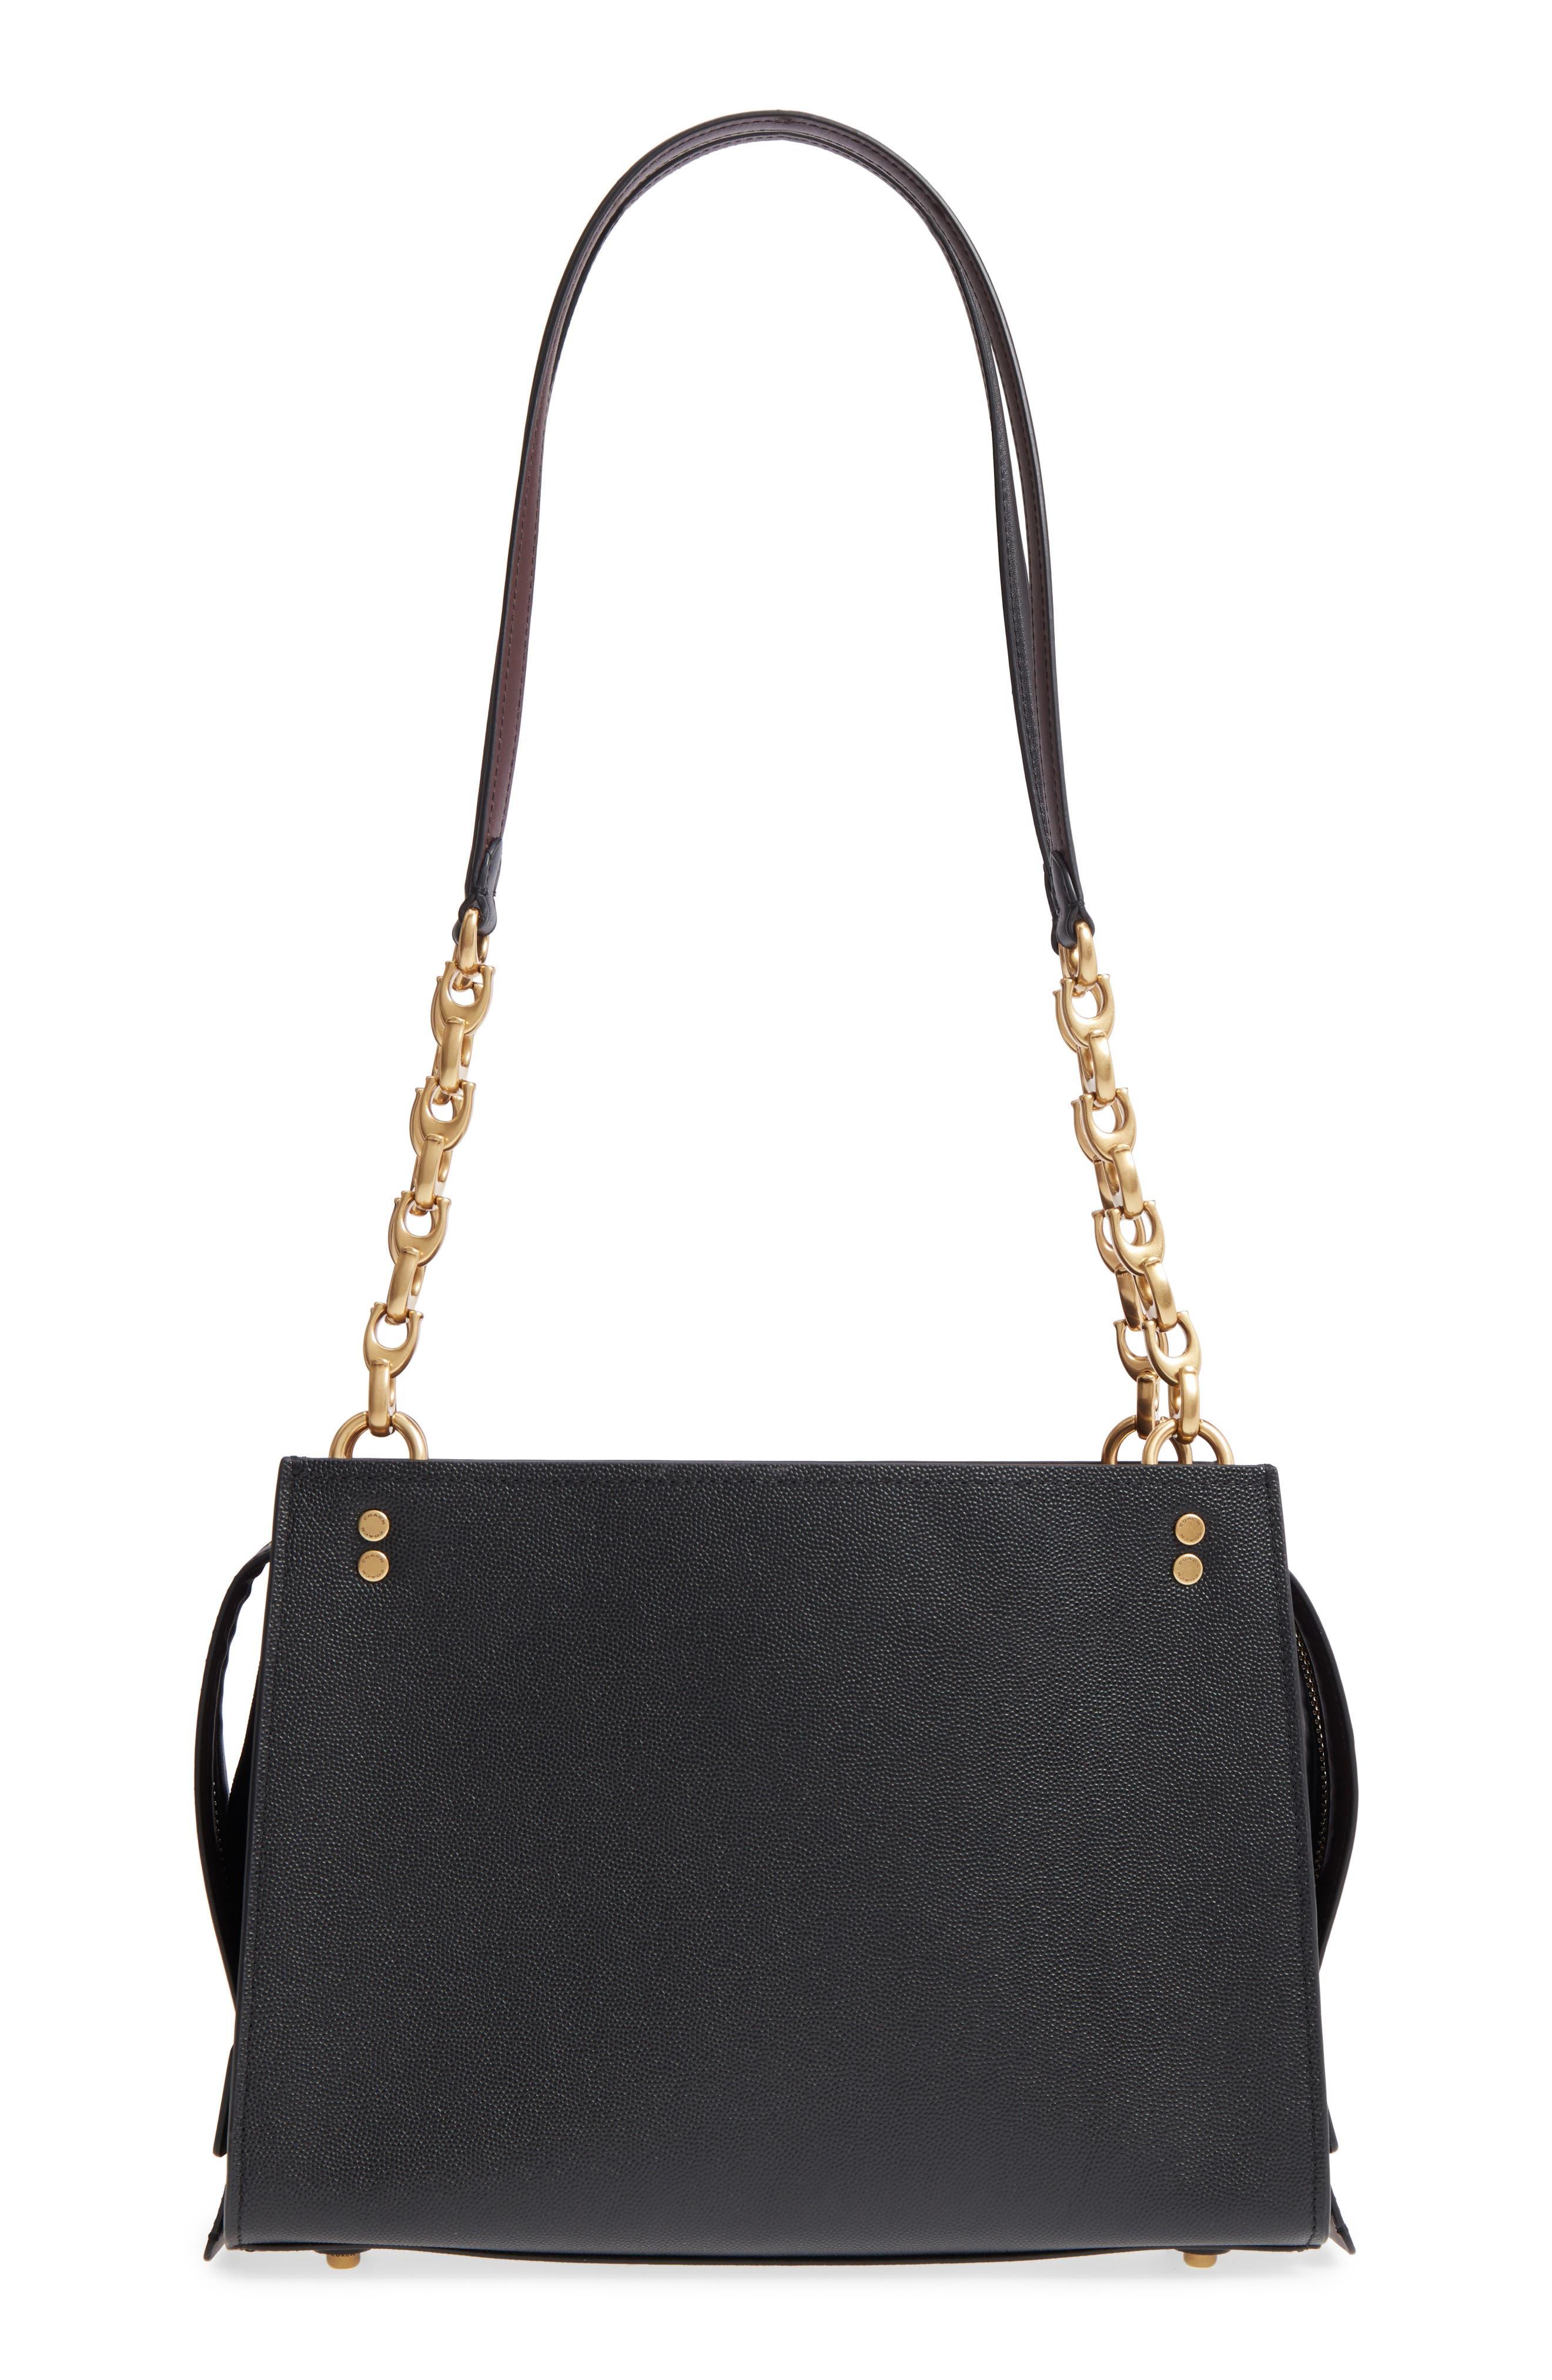 Rogue Leather Shoulder Bag,                             Main thumbnail 1, color,                             Black